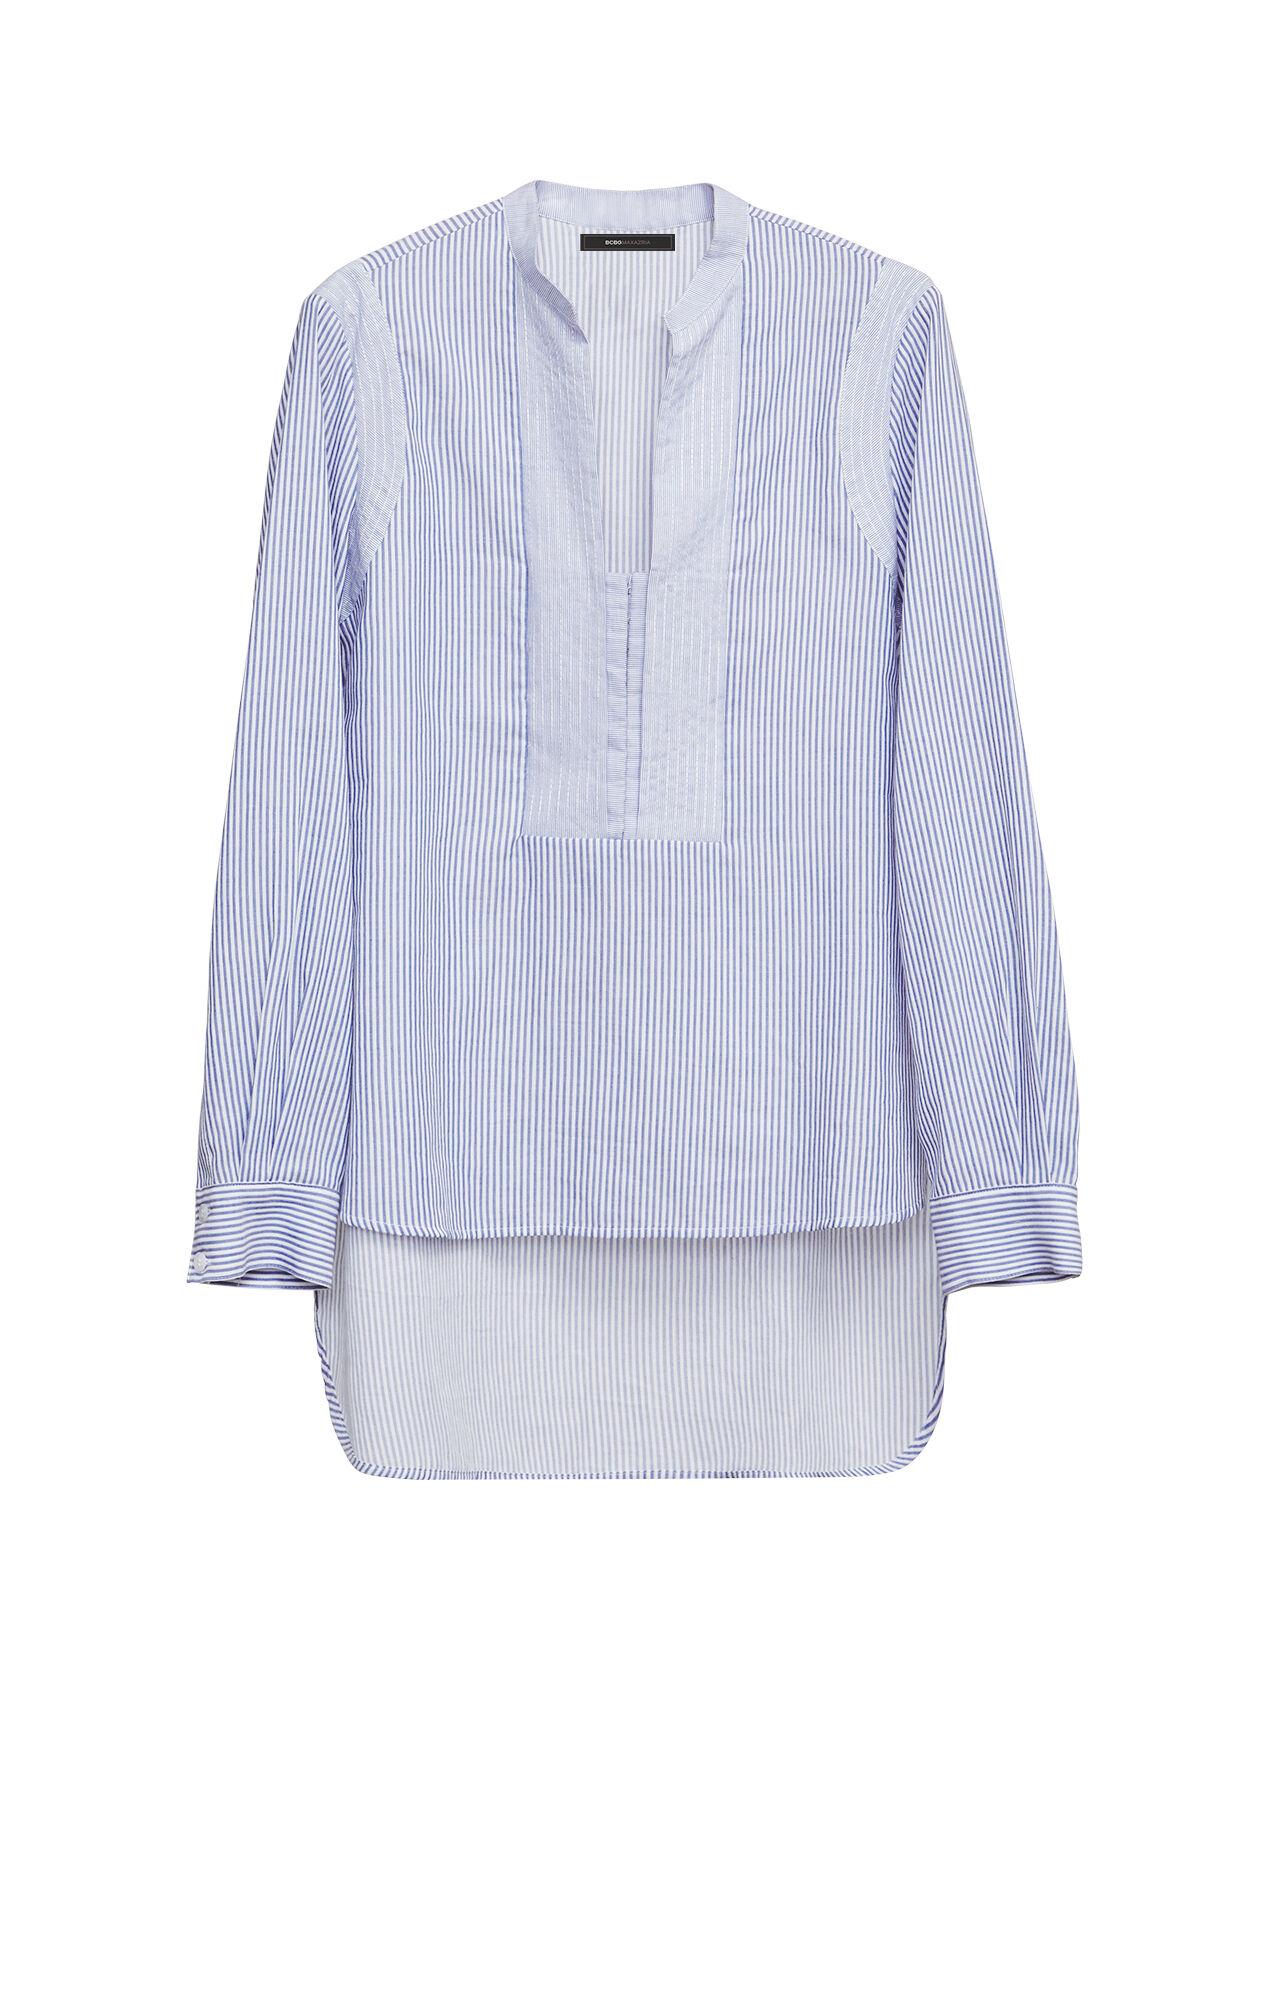 Jola Long-Sleeve Fabric-Blocked Top